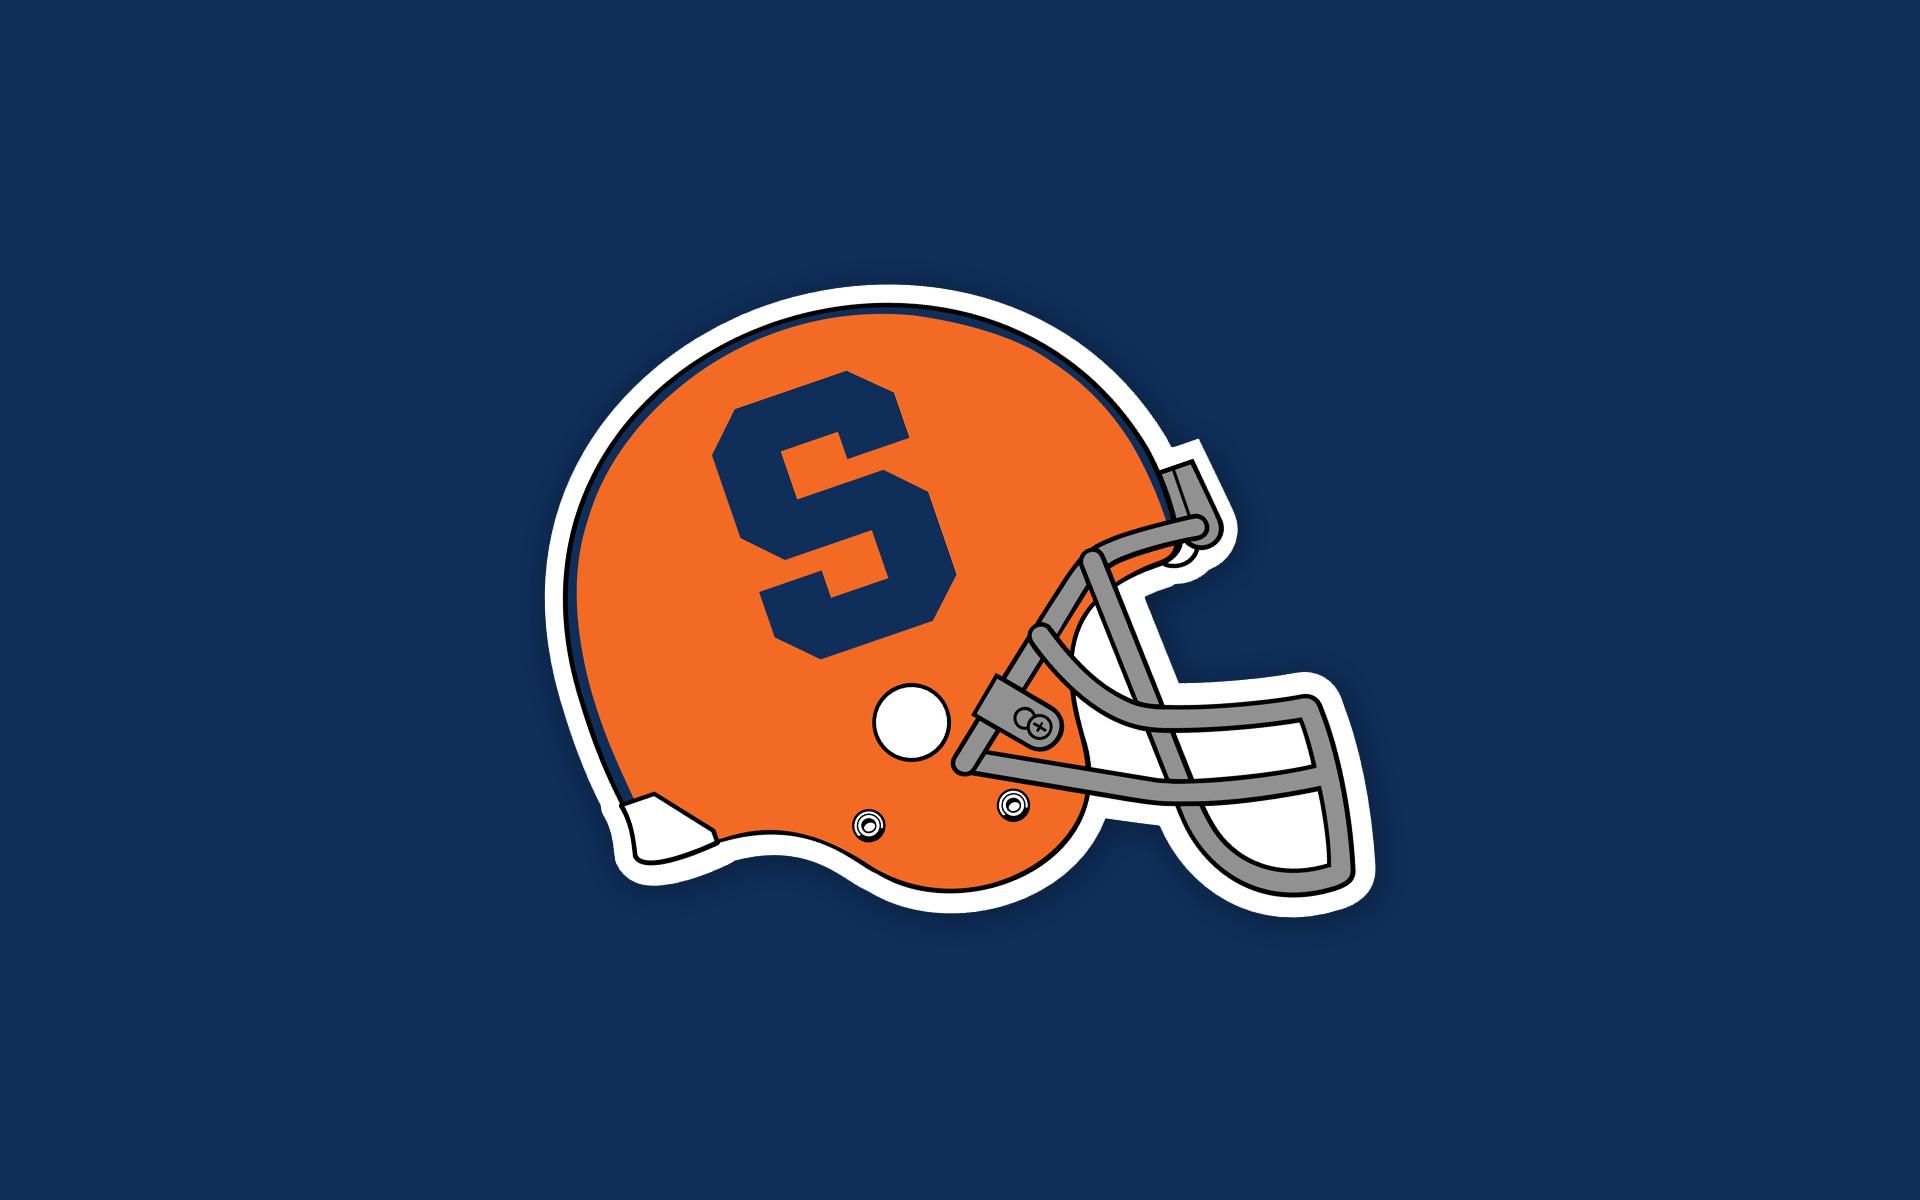 Syracuse Football Wallpaper – https://wallpaperzoo.com/syracuse-football-